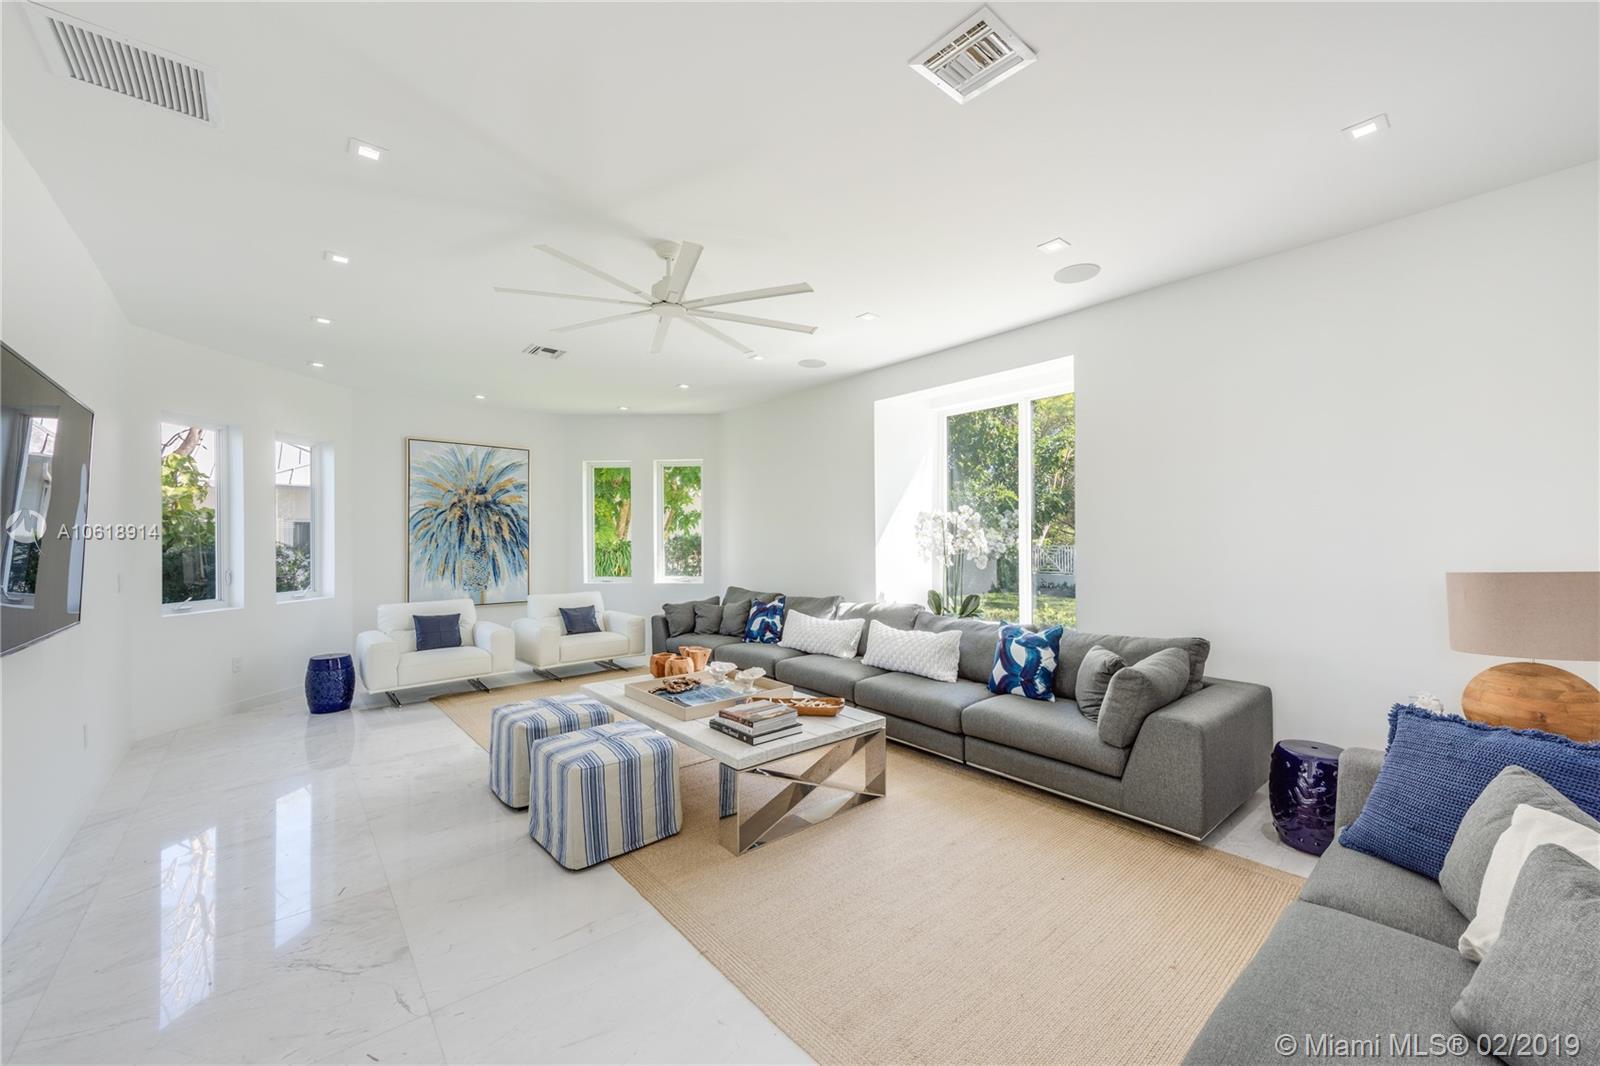 741 Buttonwood Ln, Miami, FL 33137